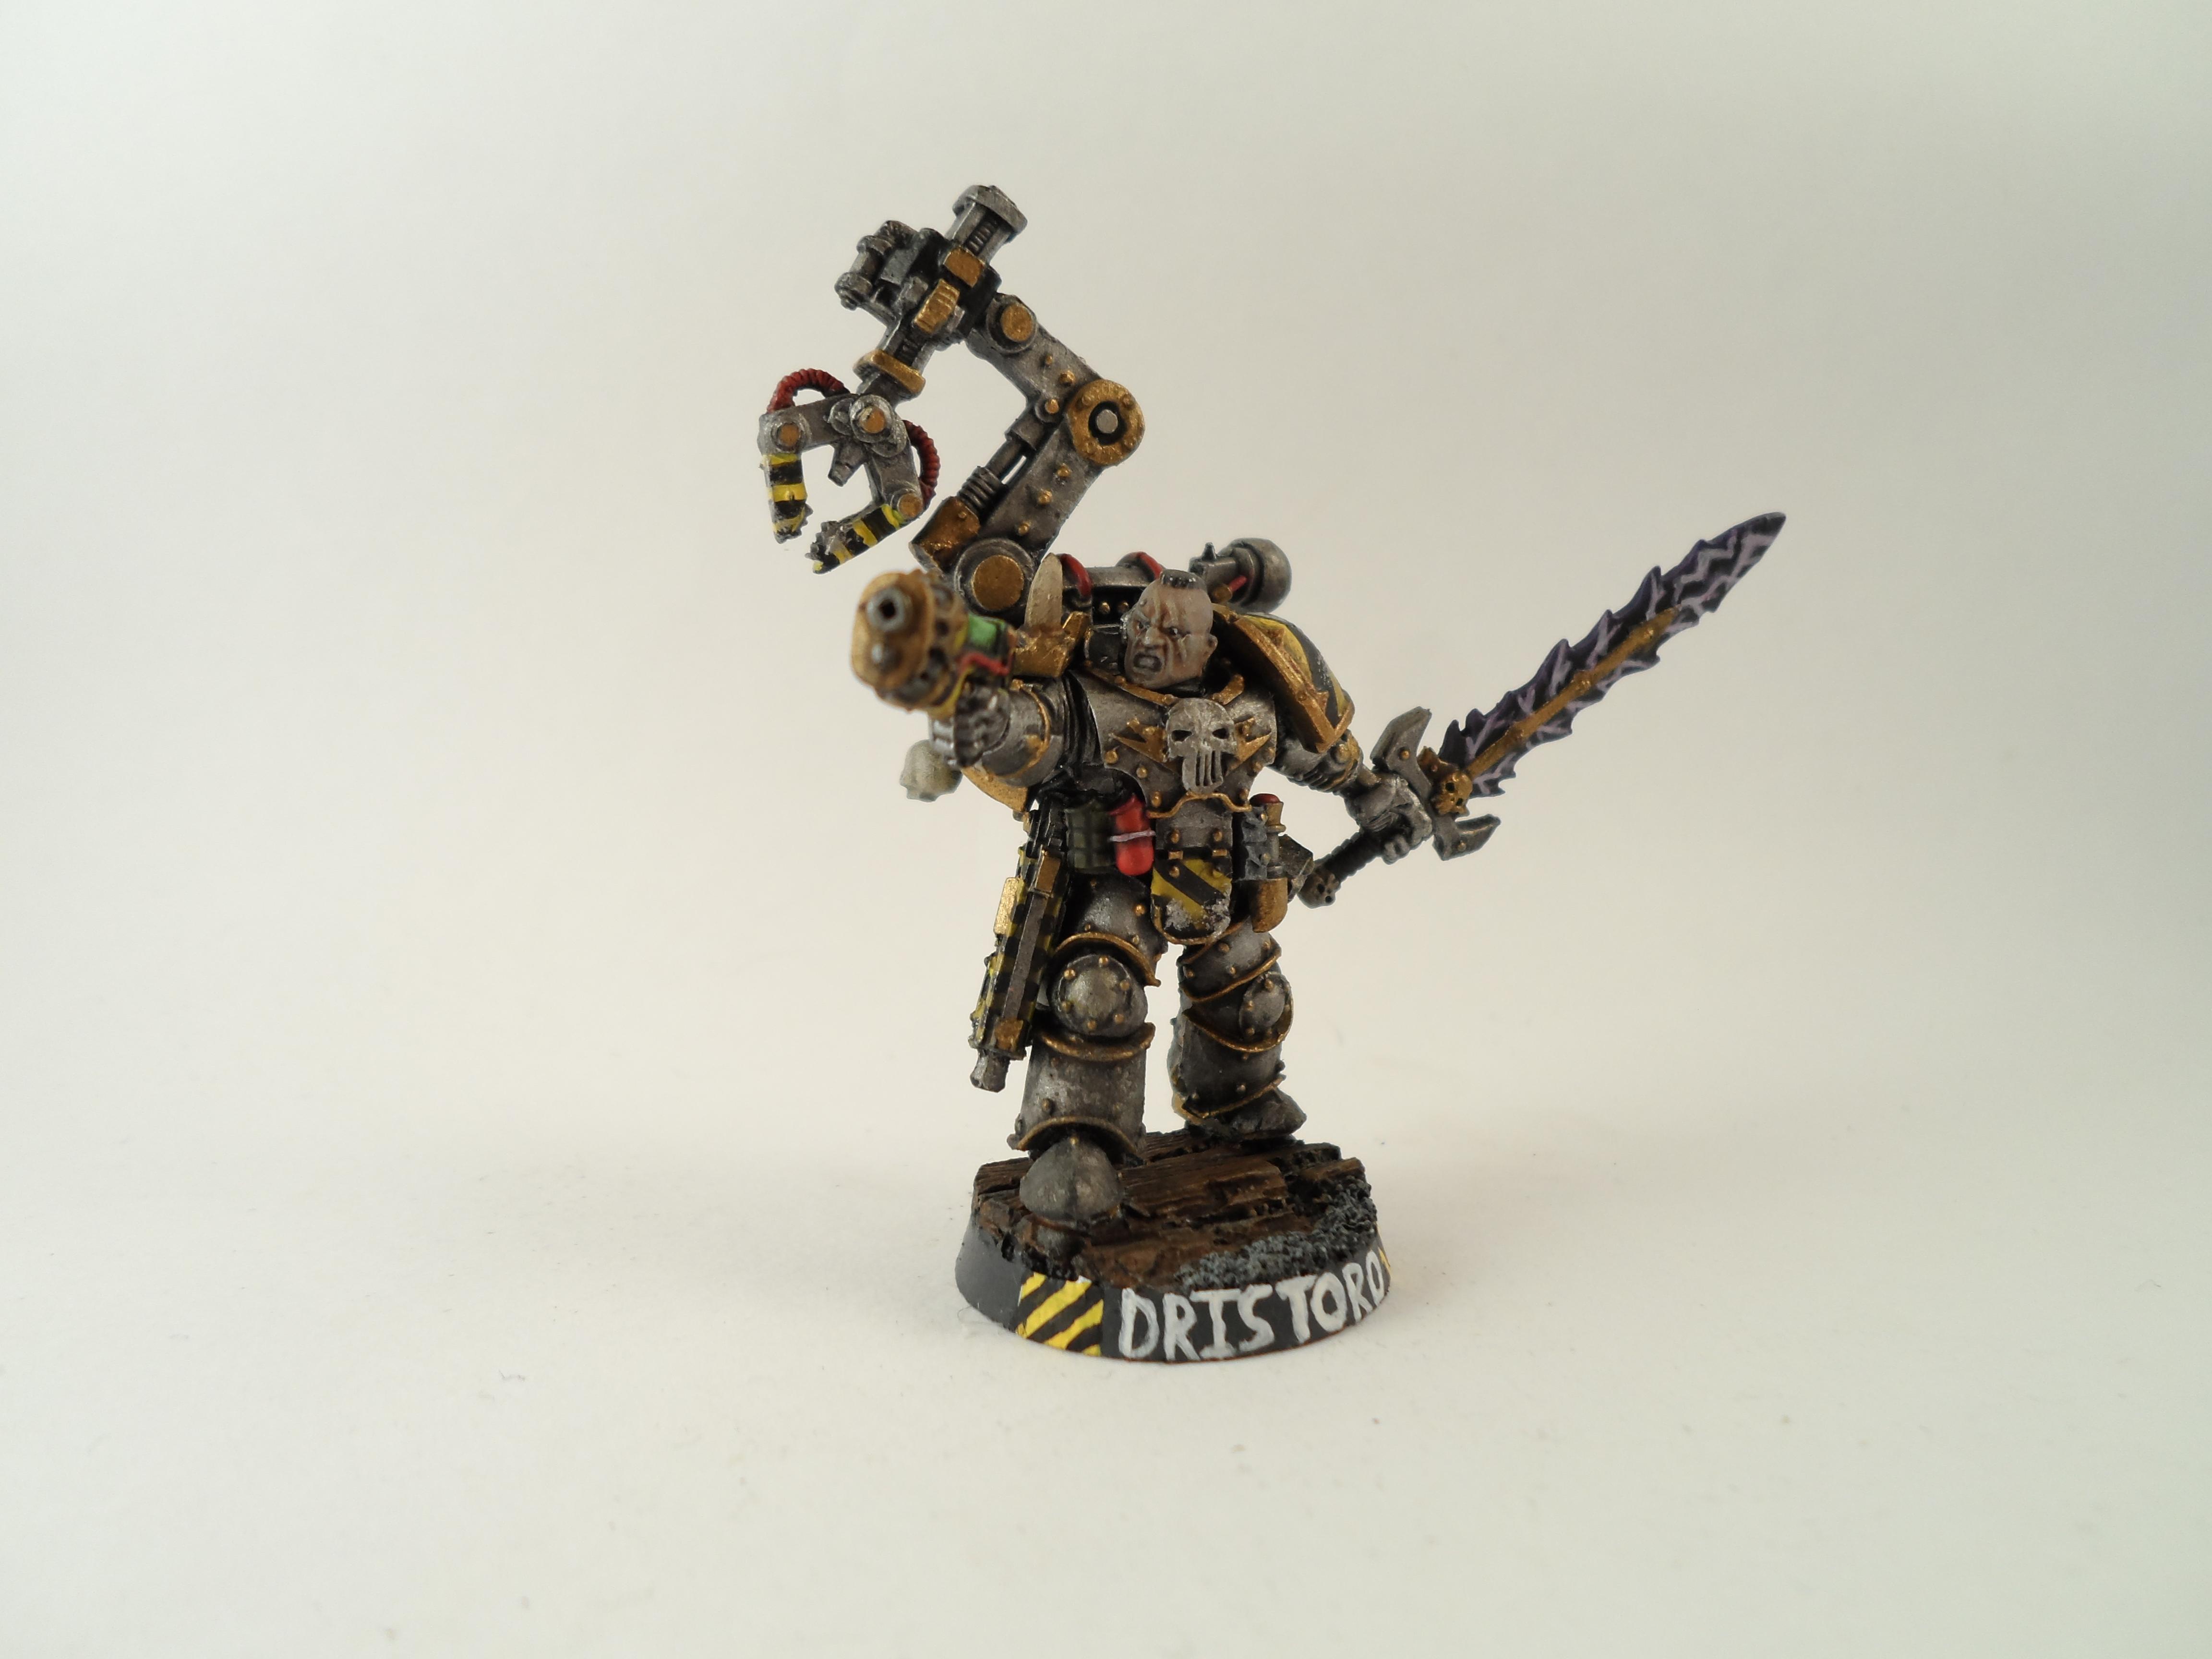 Iron Warriors Lieutenant Dristoro